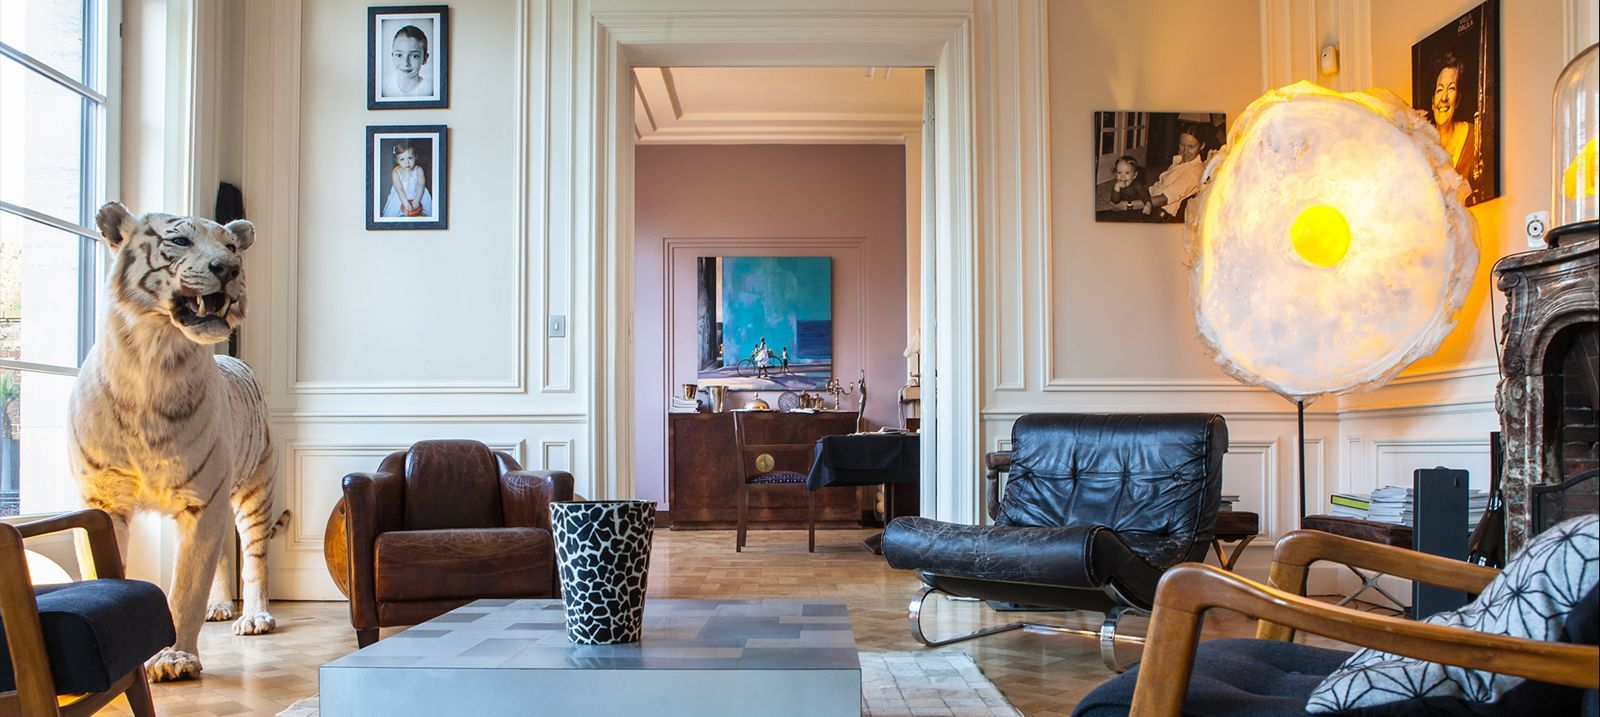 chambres d hotes lille et environs villa paula chambres d 39 h tes tourcoing roubaix lille